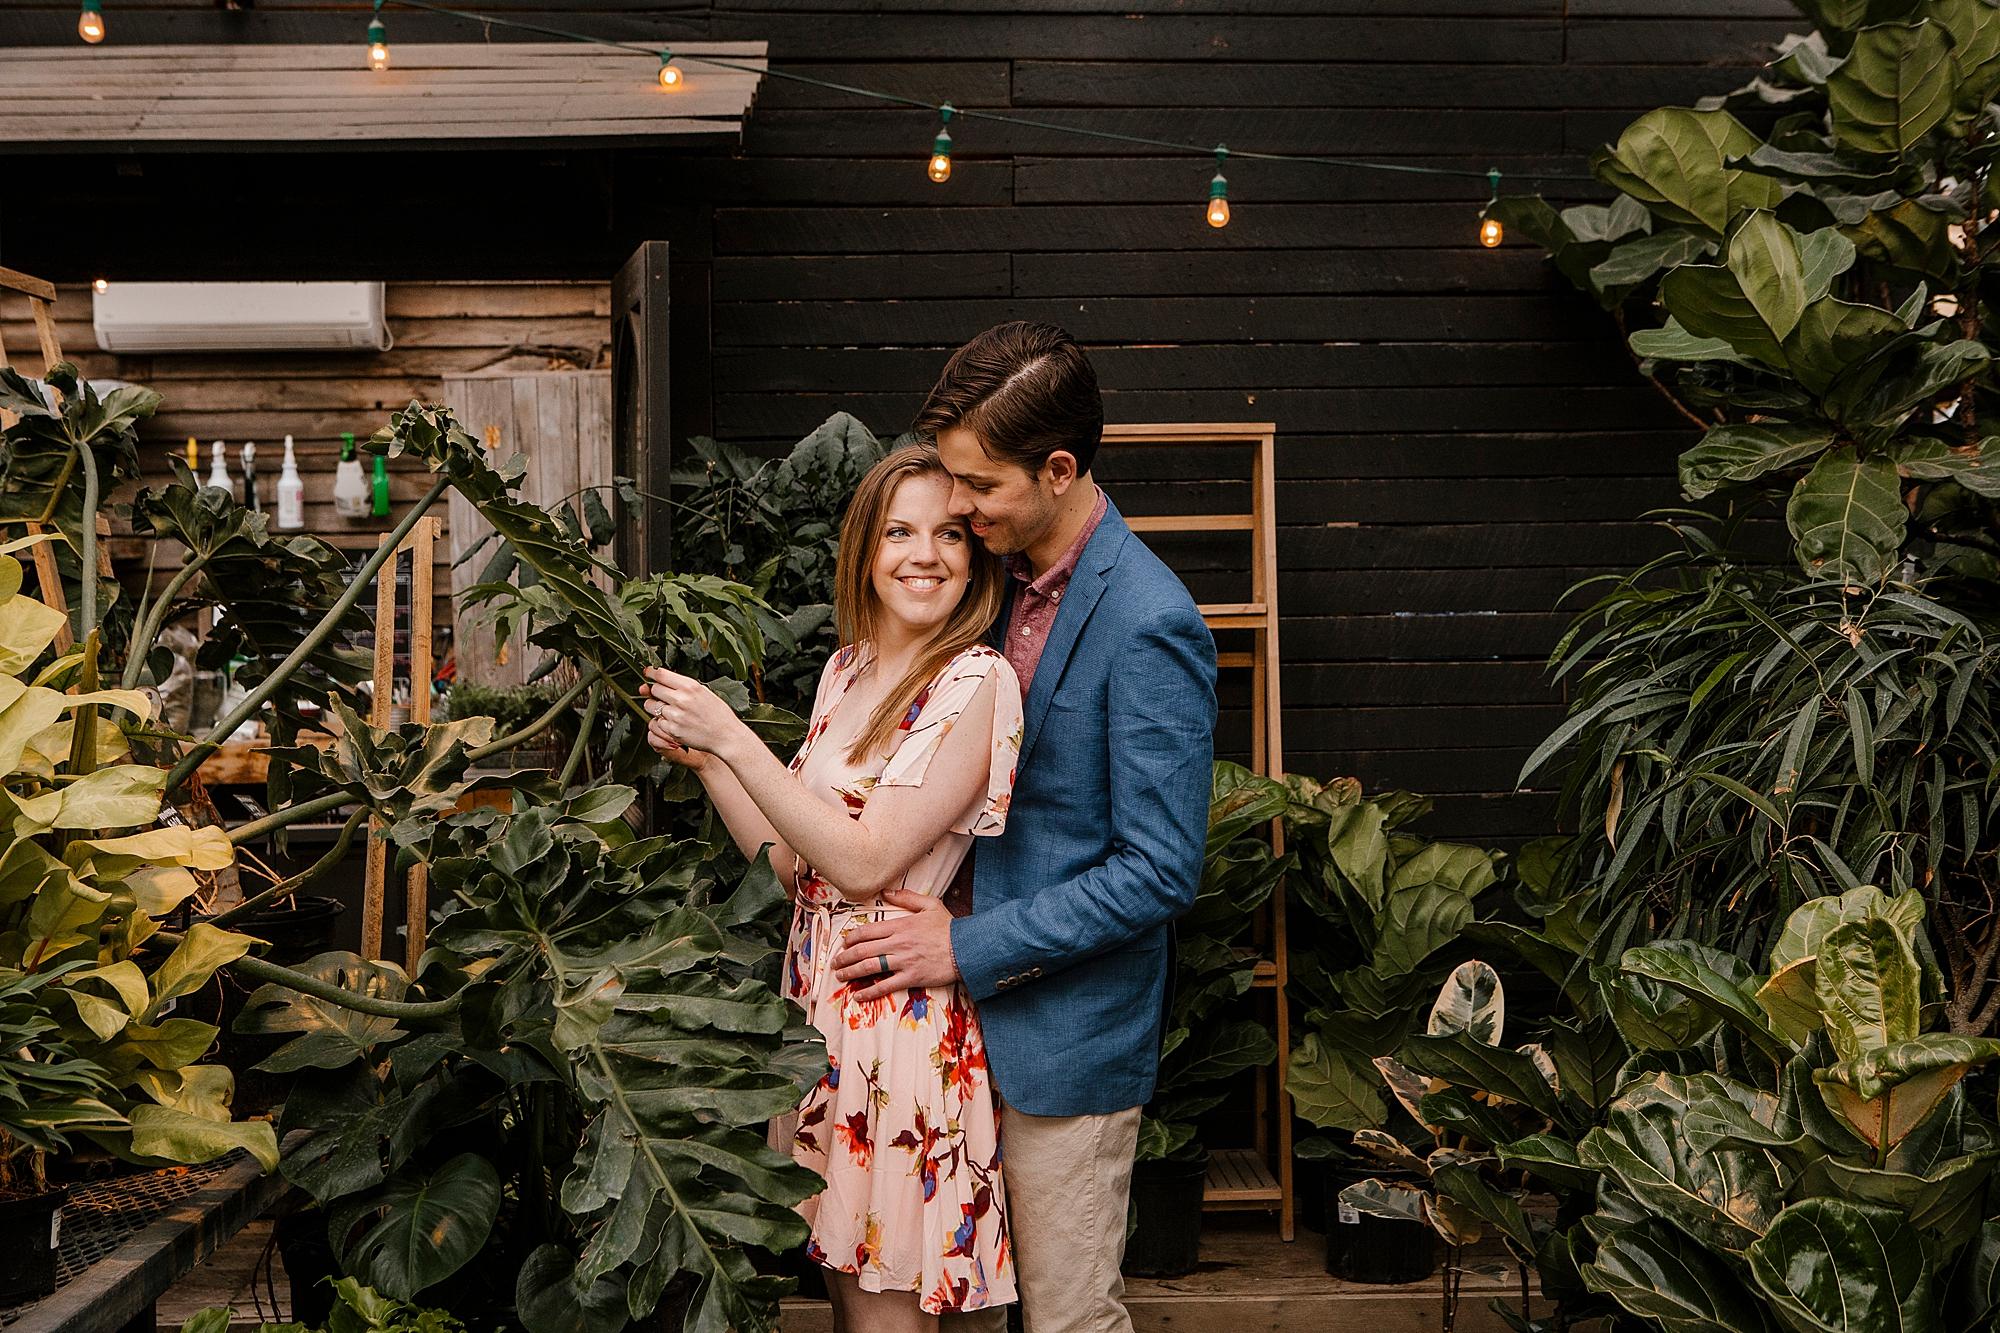 Tori_Zack_Glen_Mills_Terrain Cafe_Wedding_Engagement_Photography_Joe_Mac_Creative__0025.jpg